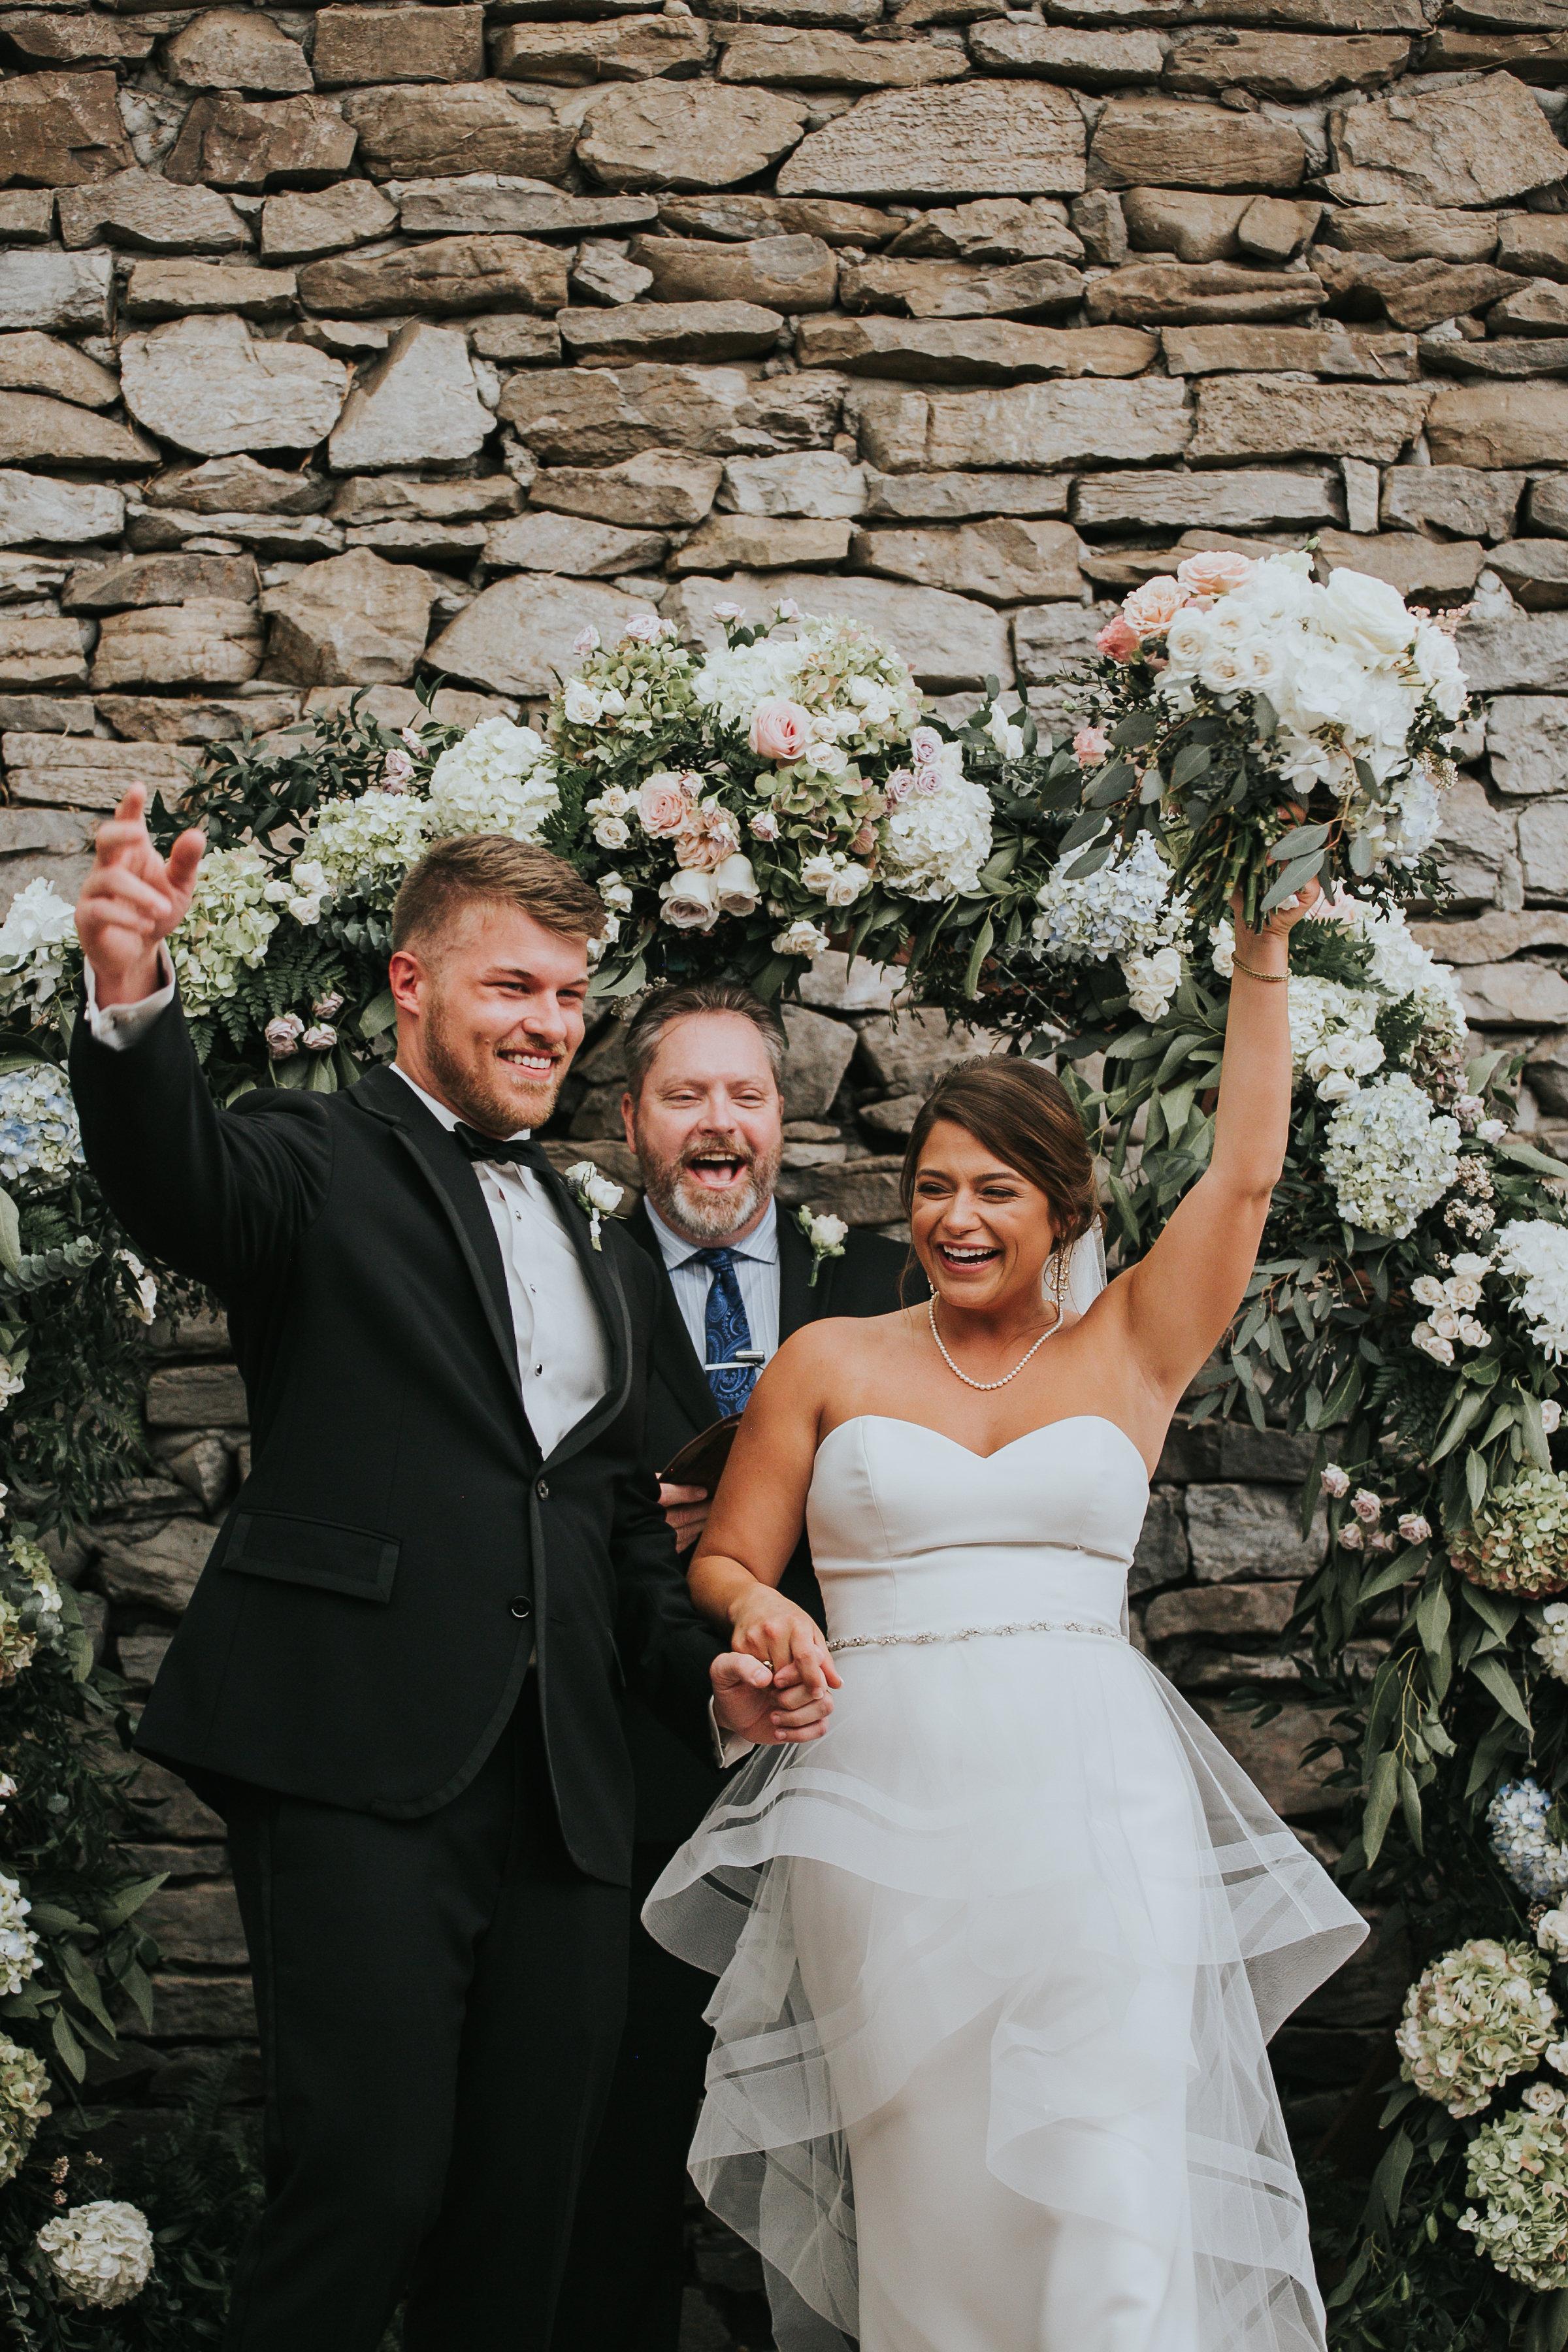 Mr. & Mrs. Ryan Galyon